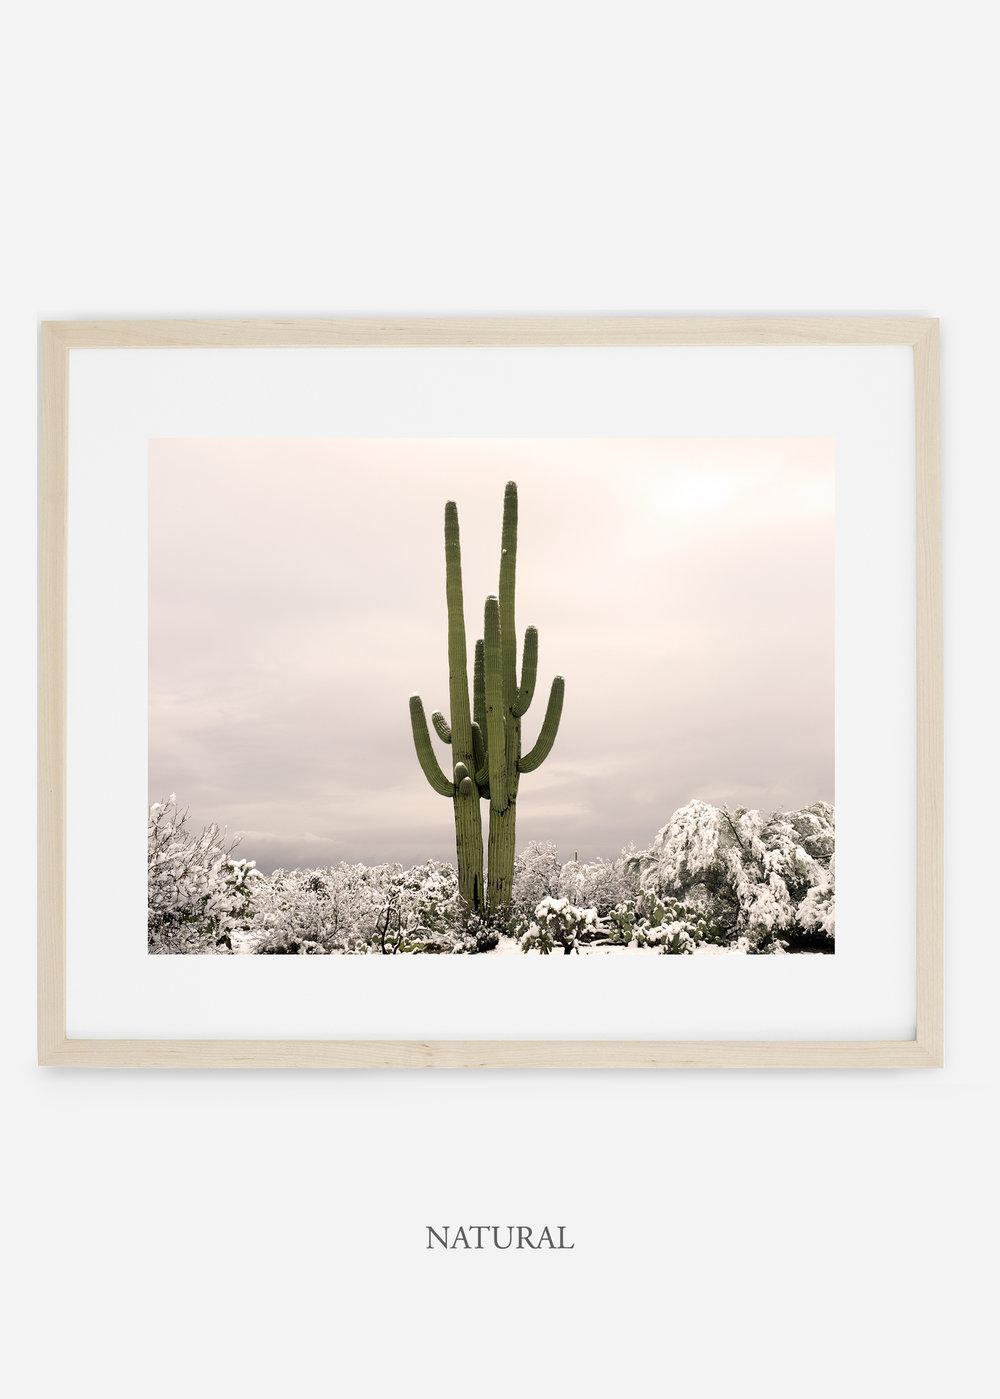 naturalframe-saguaroNo.5-wildercalifornia-art-wallart-cactusprint-homedecor-prints-arizona-botanical-artwork-interiordesign.jpg